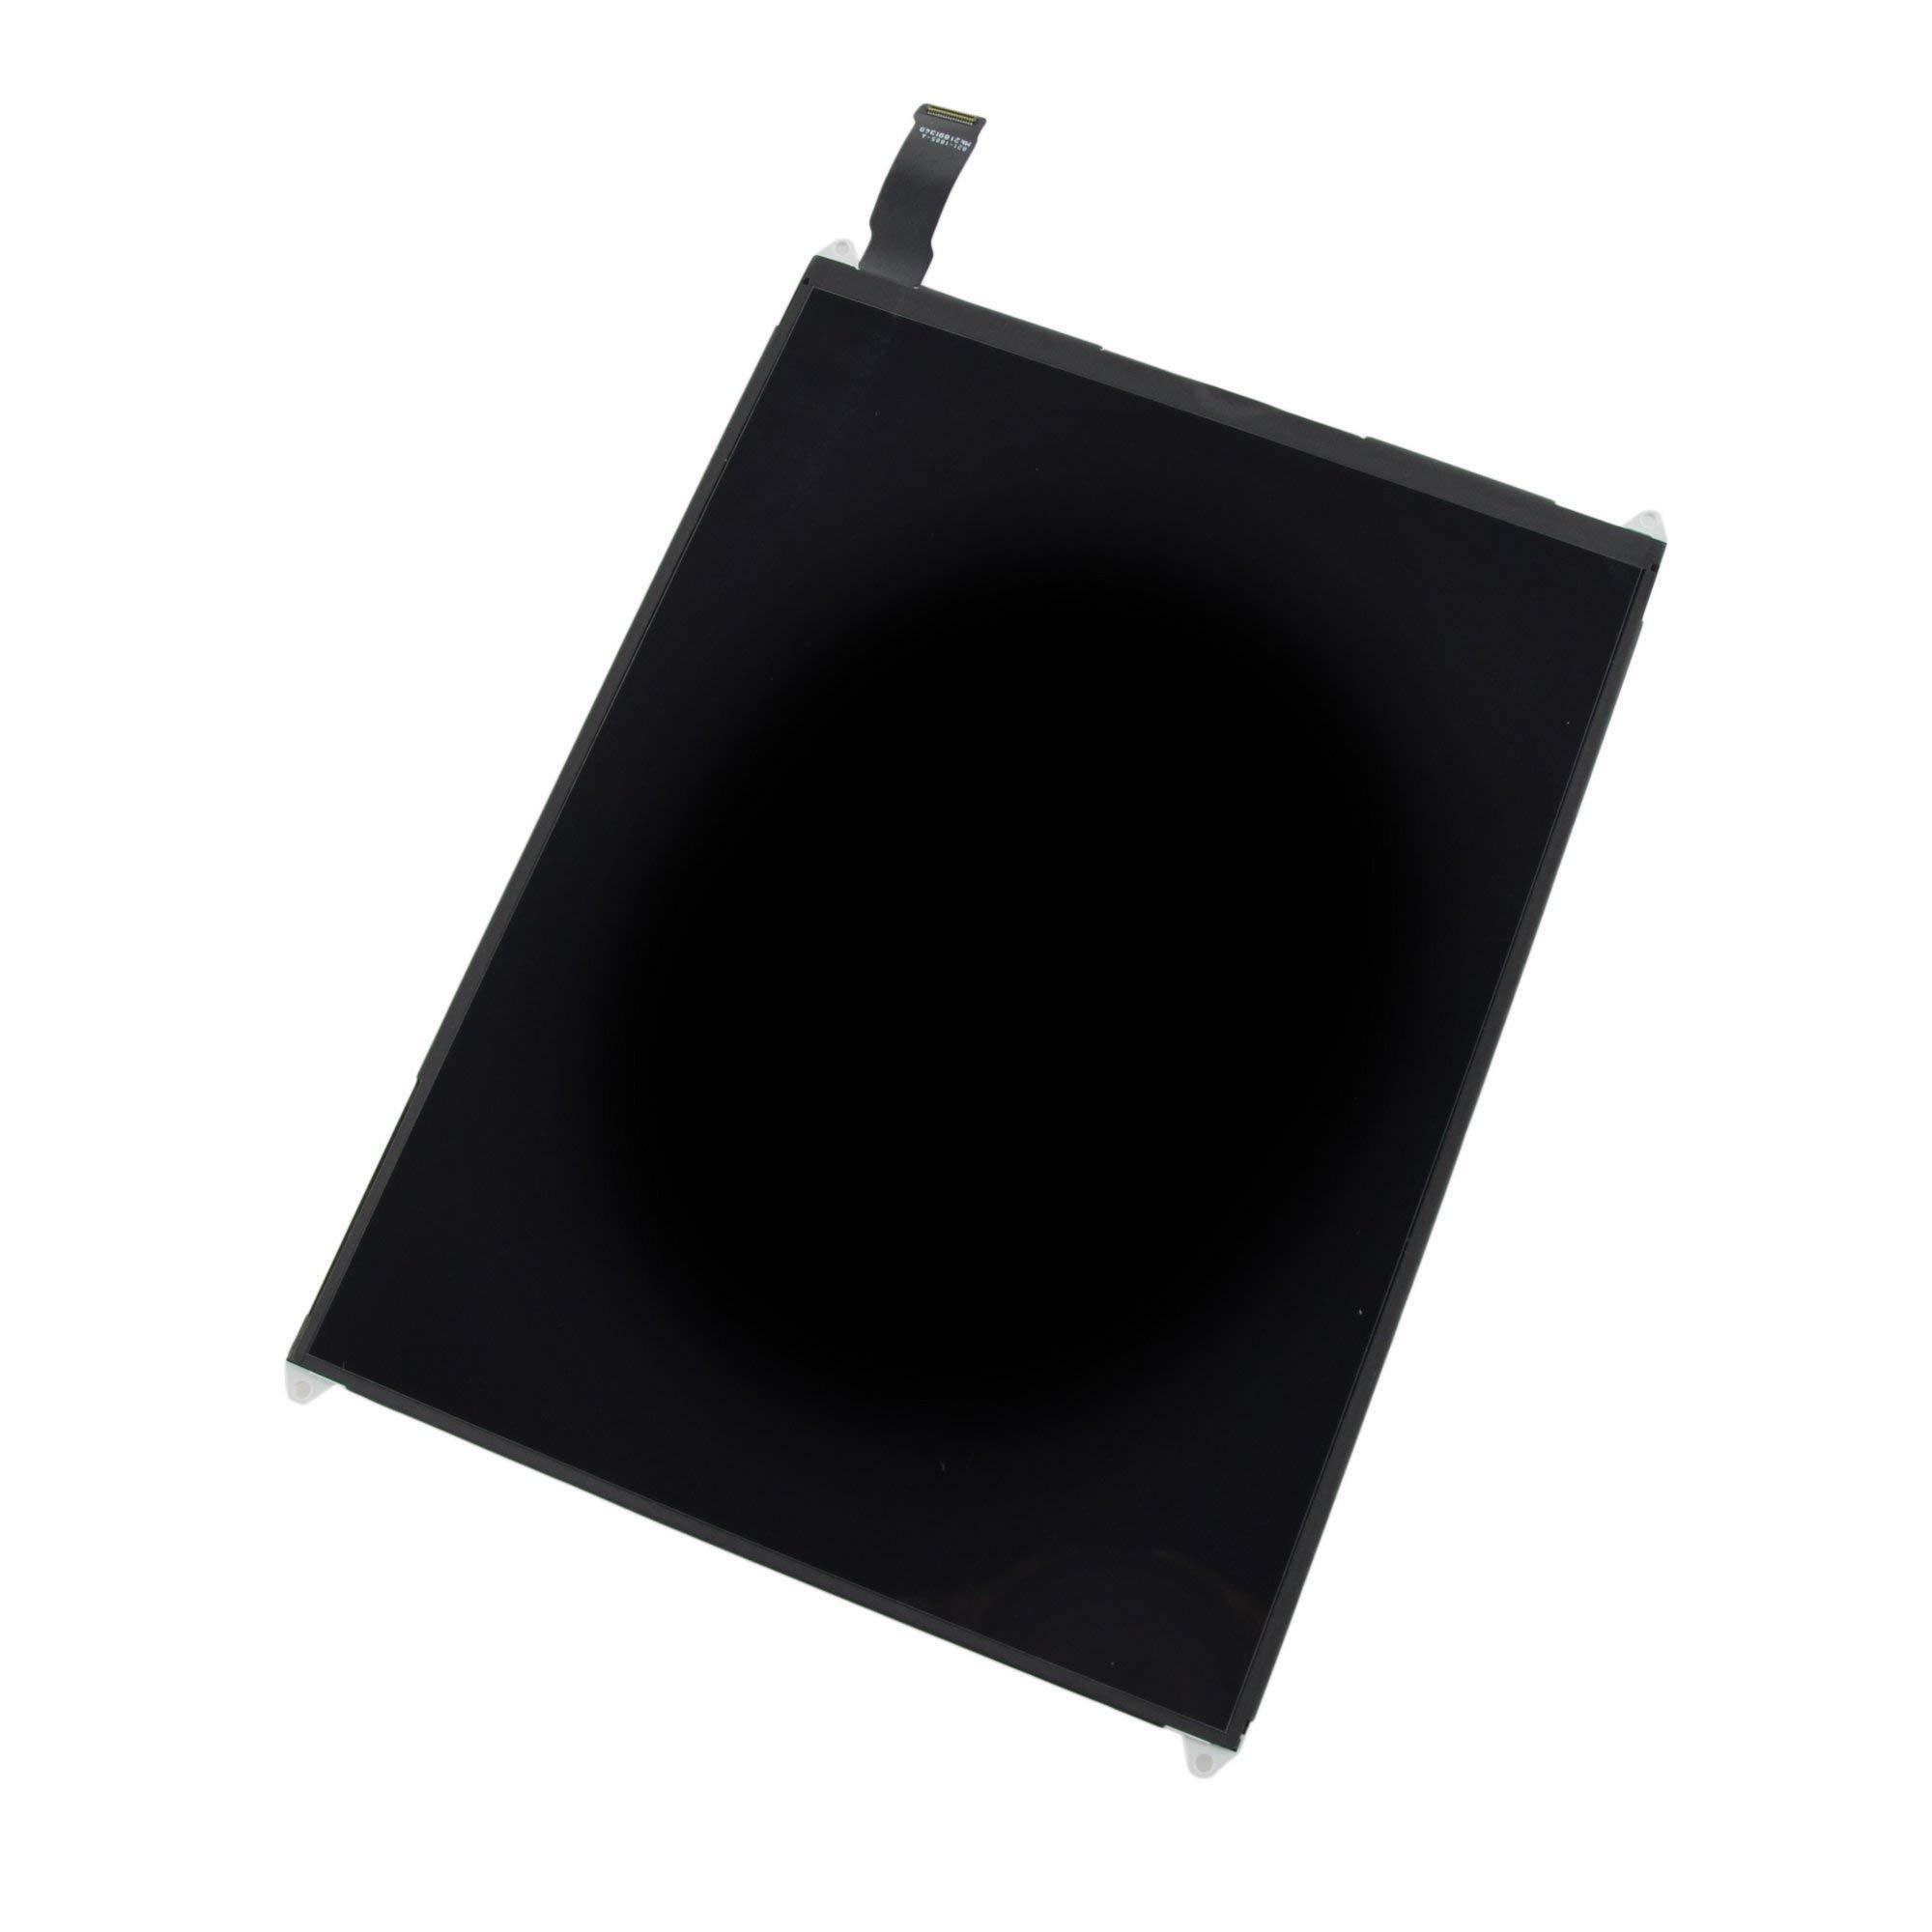 LCD Compatible with iPad Mini 2